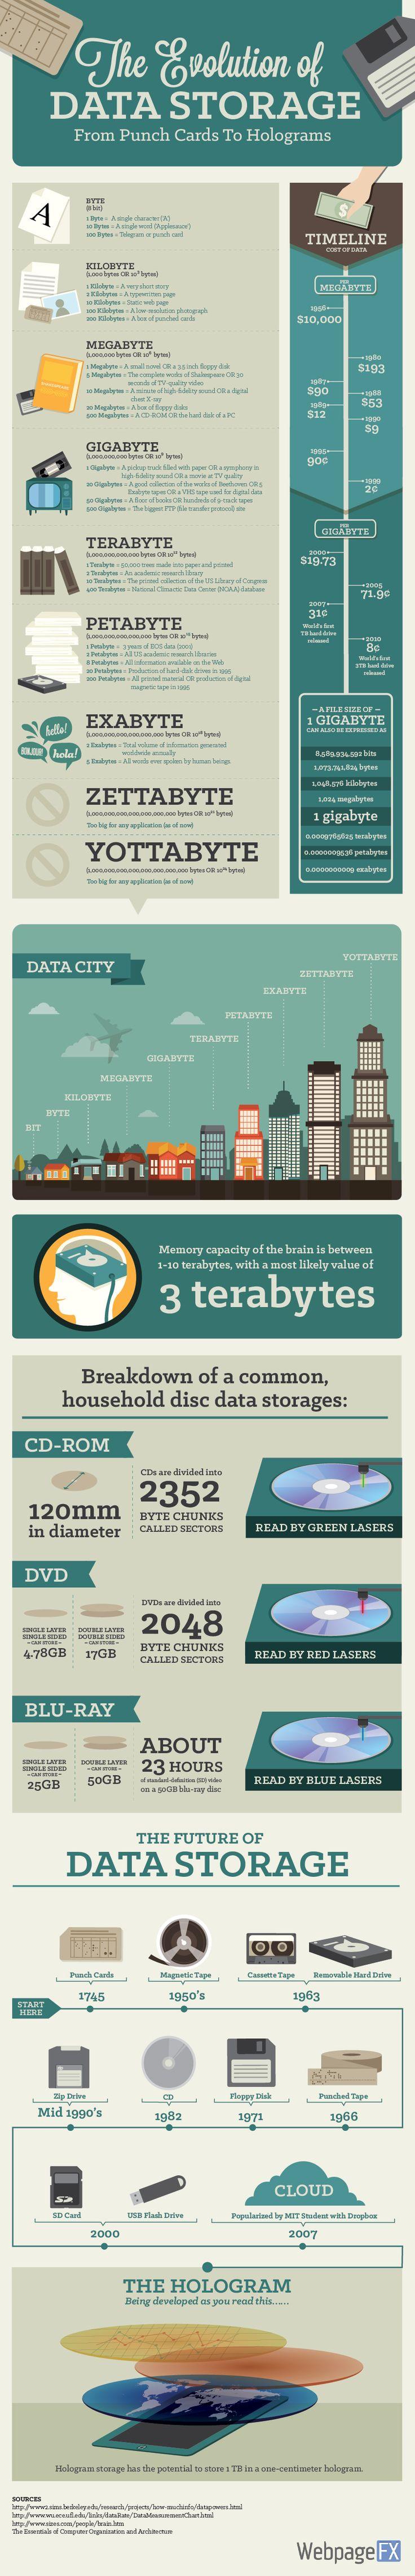 The evolution of Data Storage. #infografia #infographic